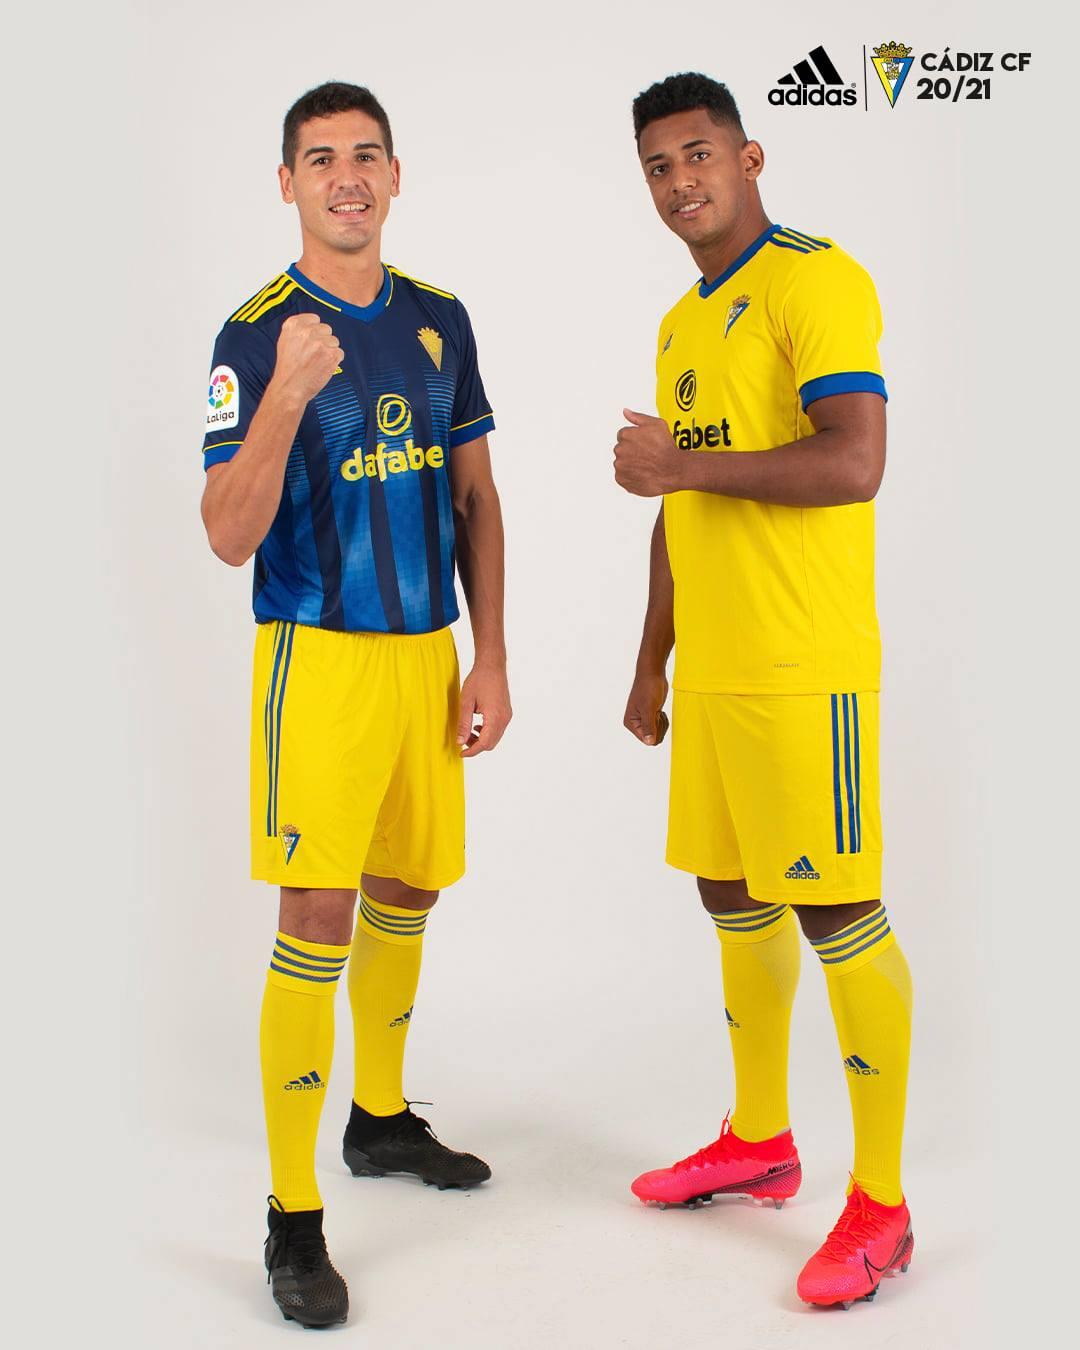 Cádiz CF 2020/21 adidas Home and Away Kits - FOOTBALL FASHION